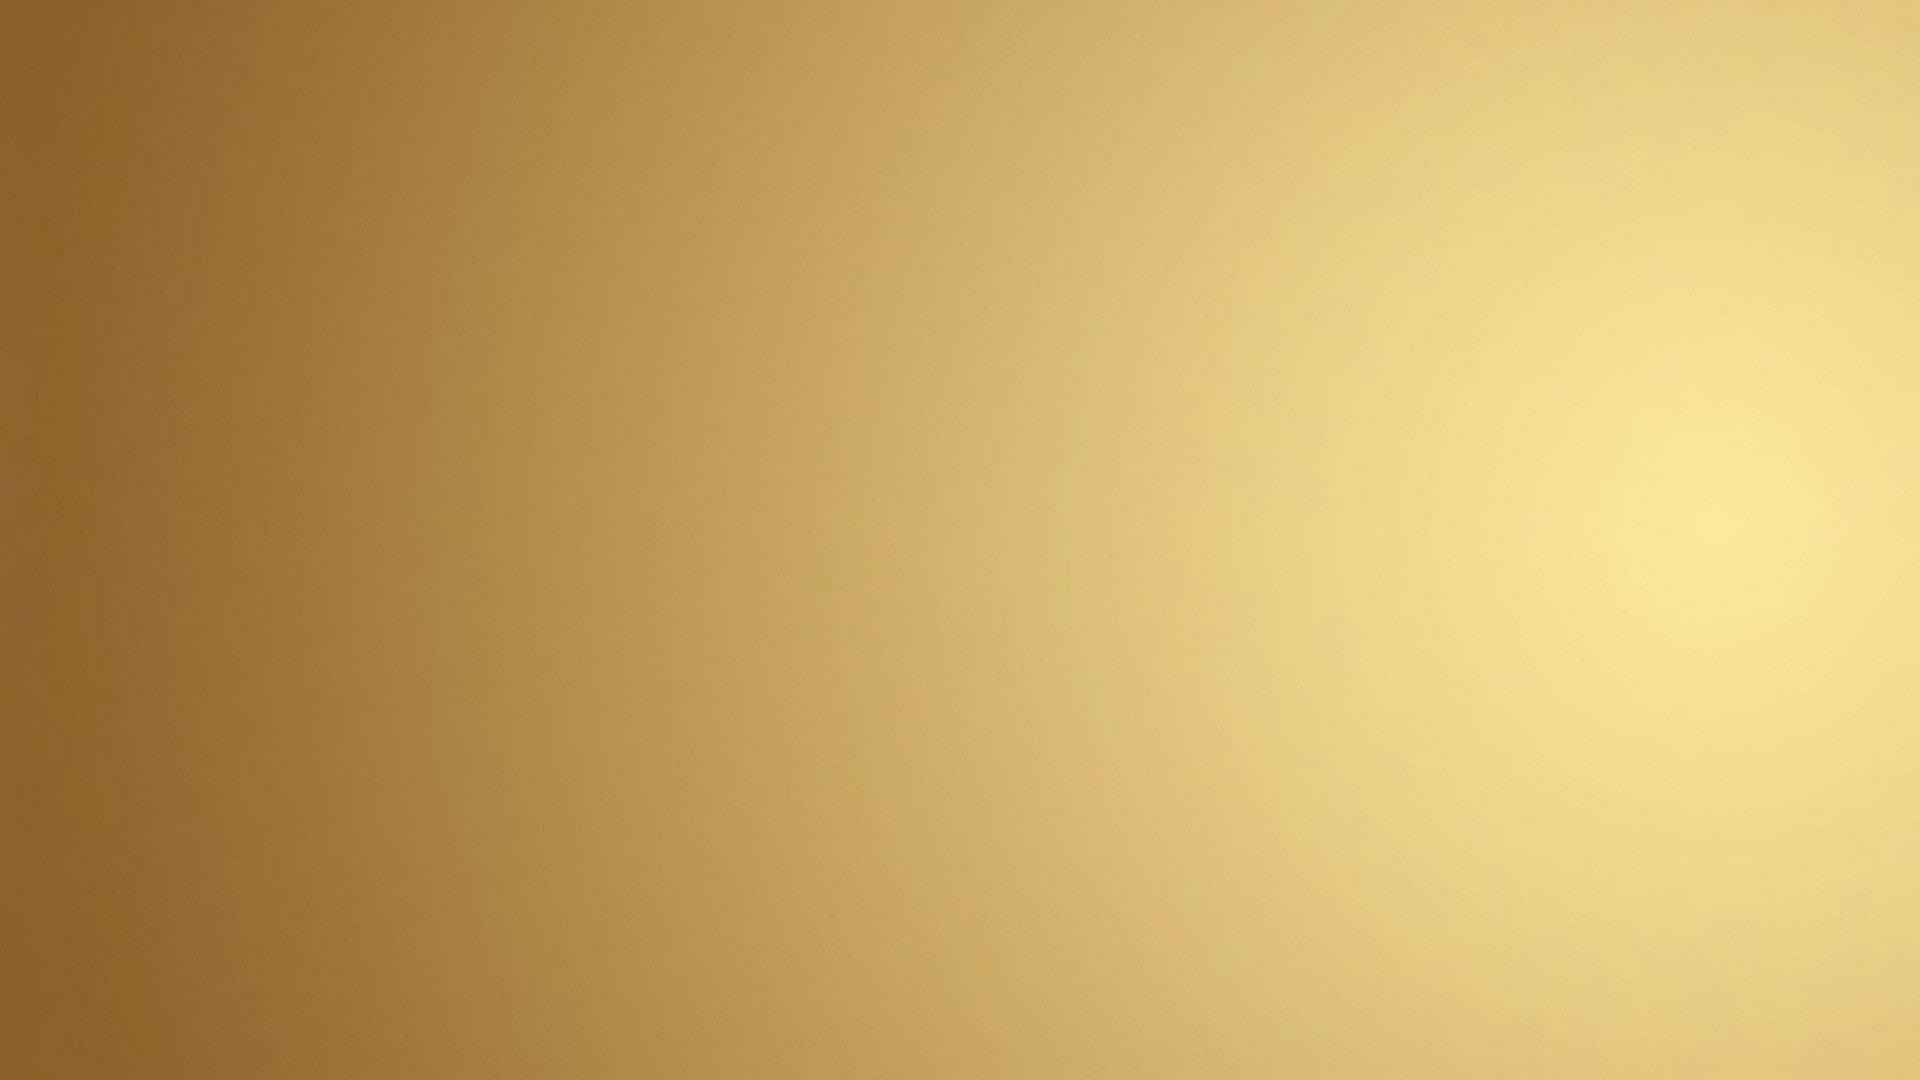 HD Wallpaper Plain Gold  Wallpaper  Color Peach colors